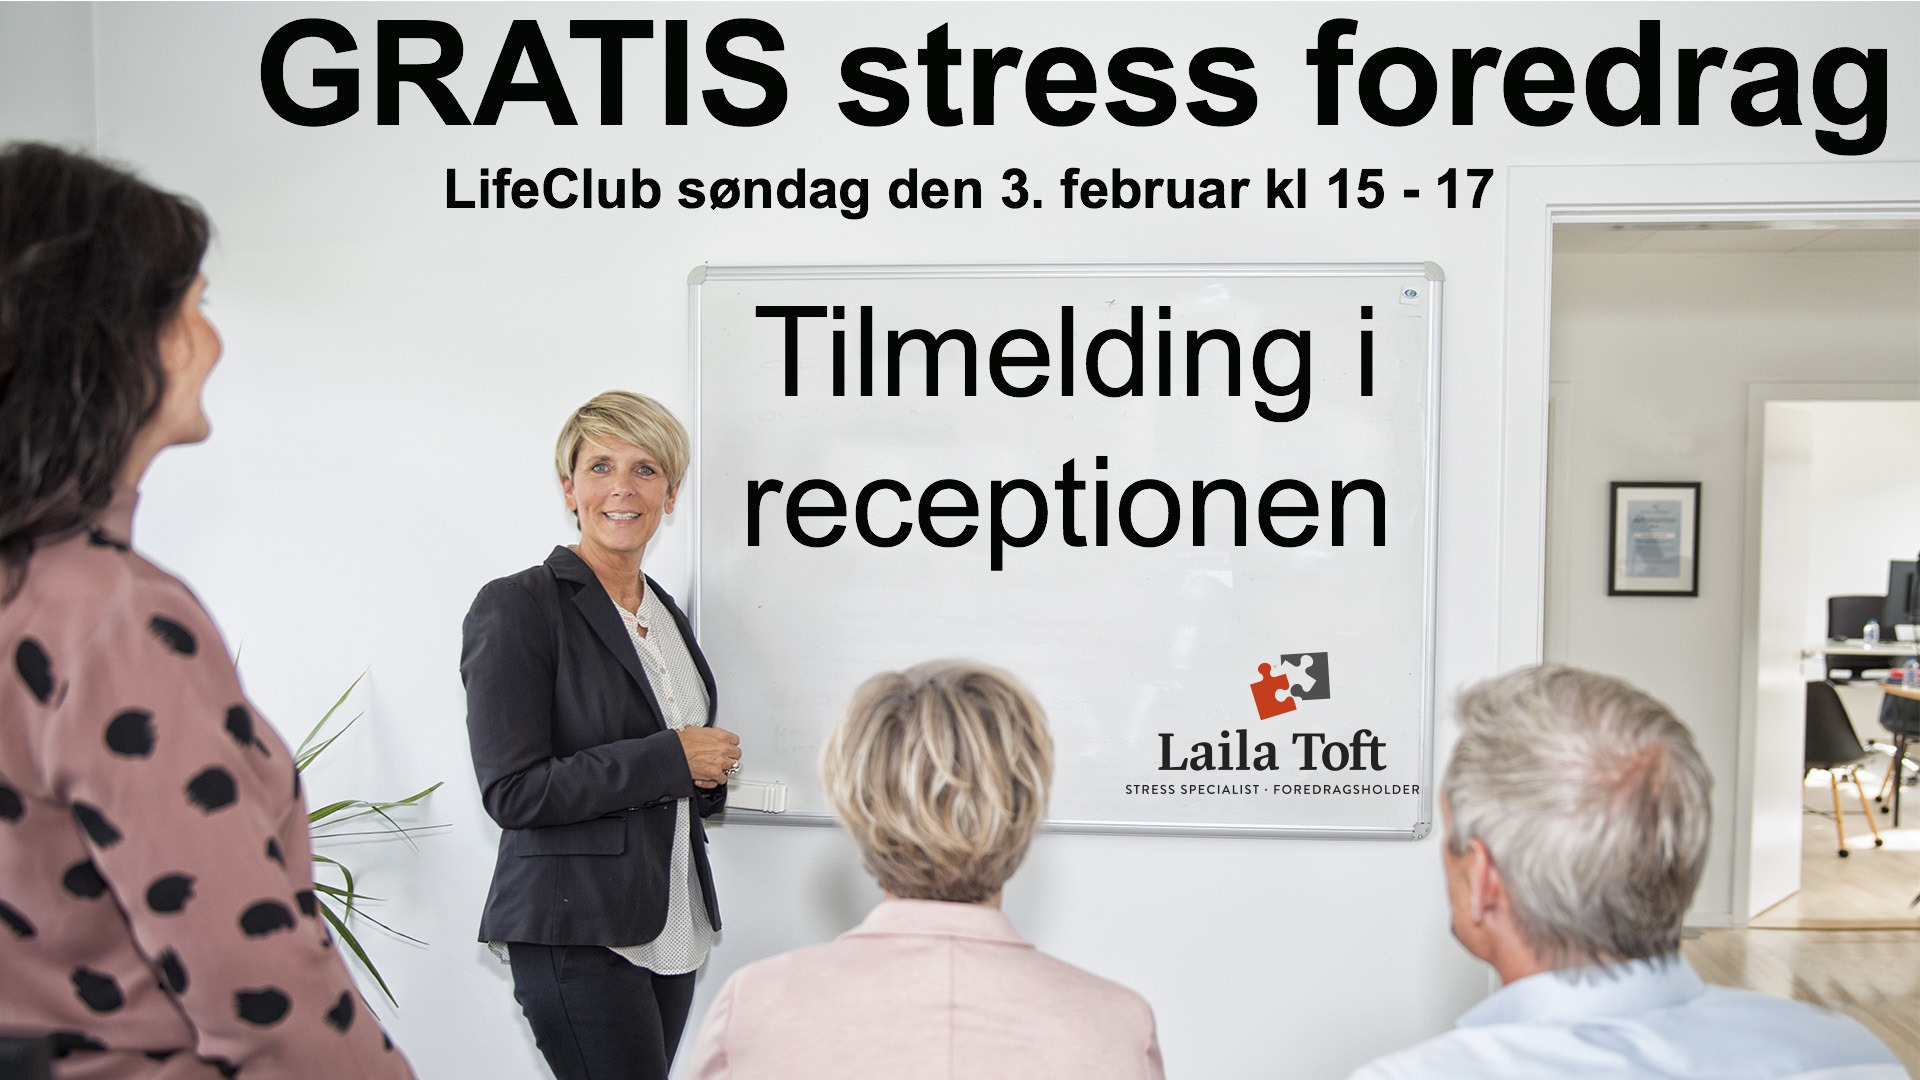 Gratis stress foredrag